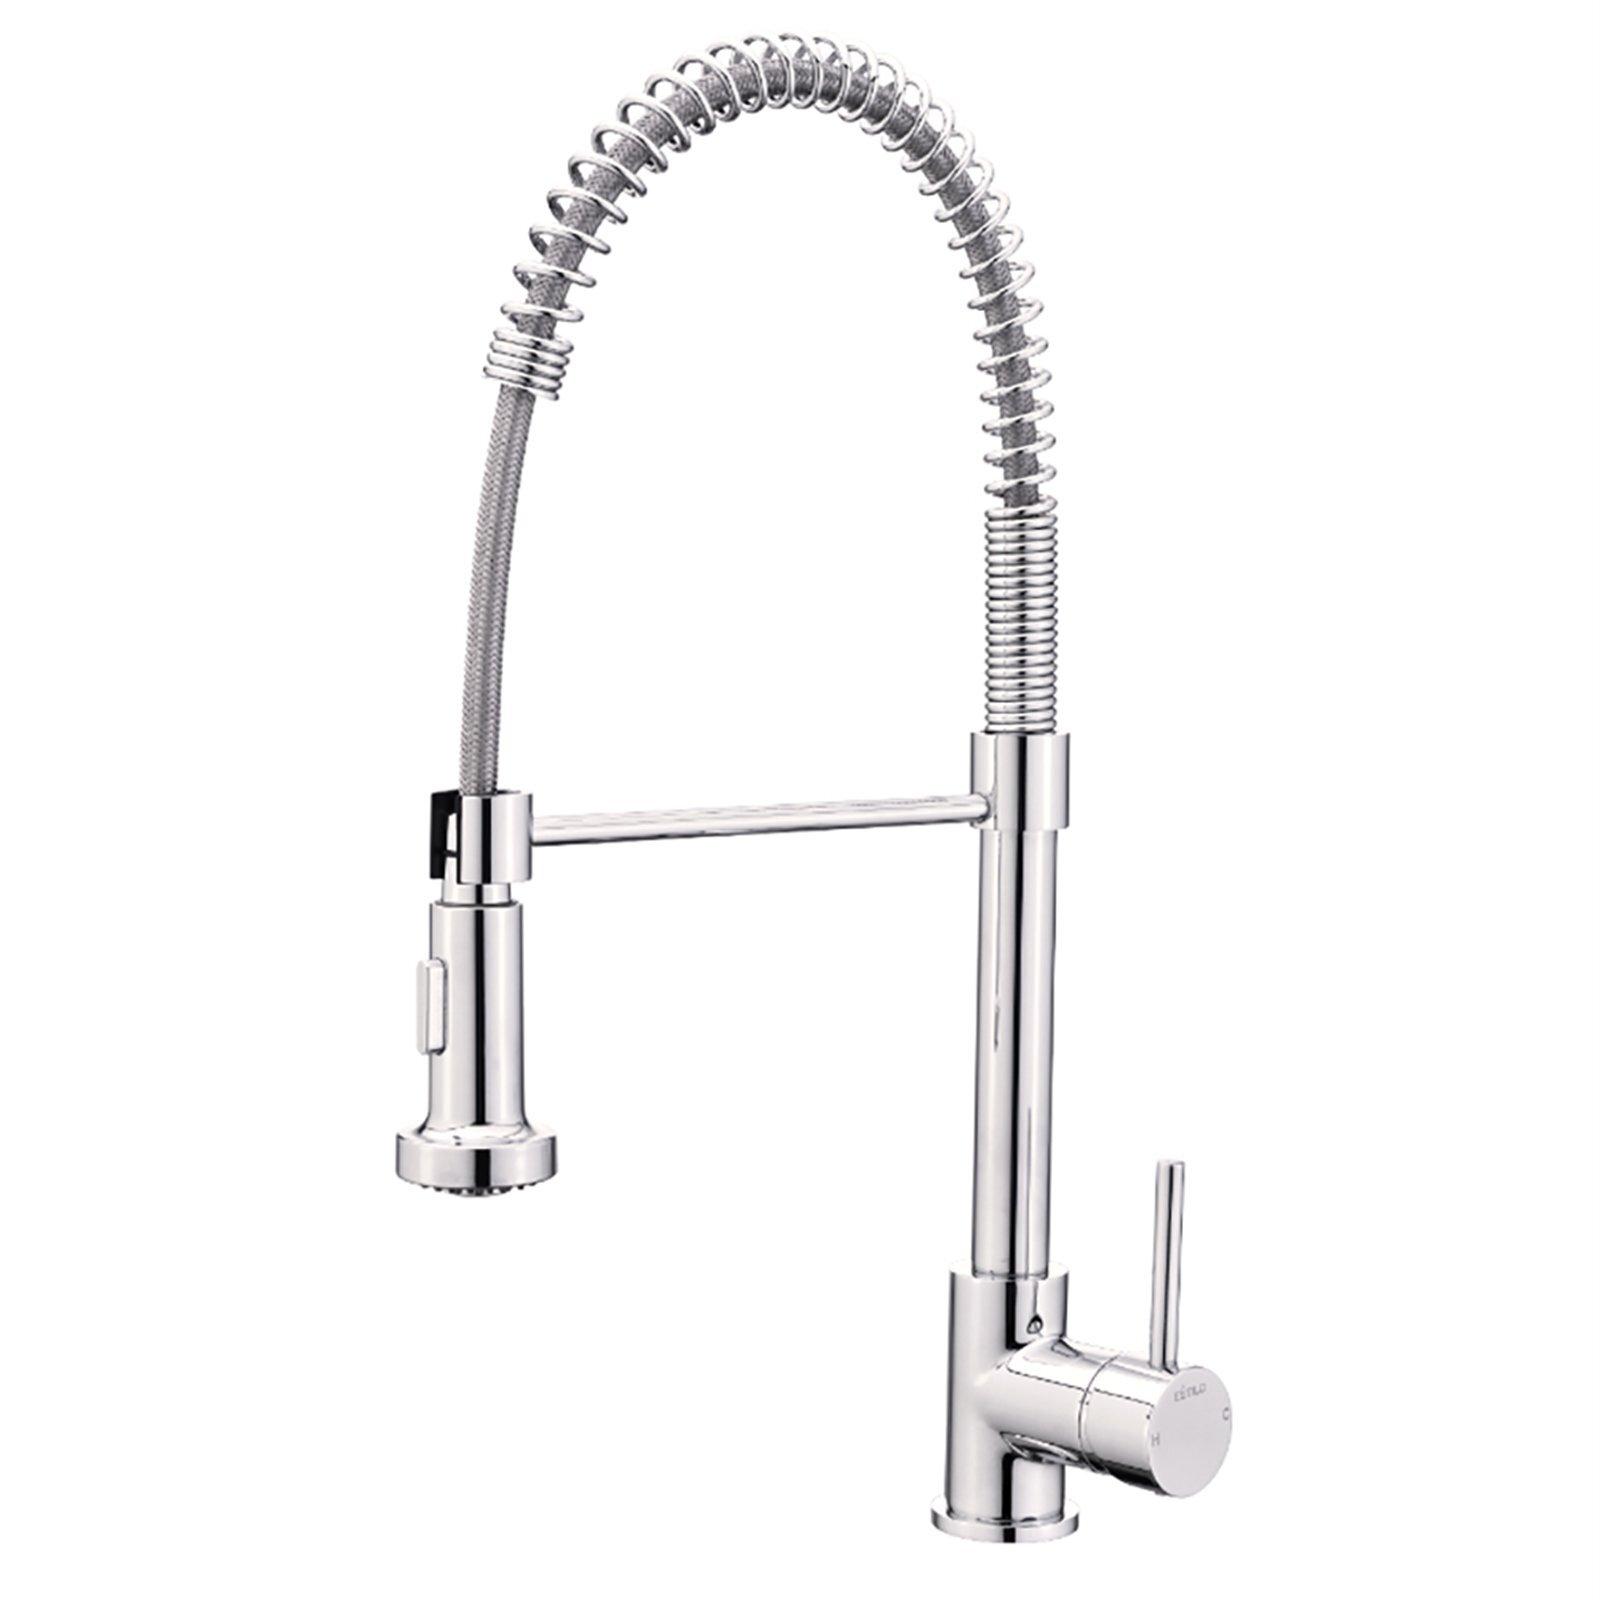 Estilo Chrome Tall Vege Spray Coil Sink Mixer